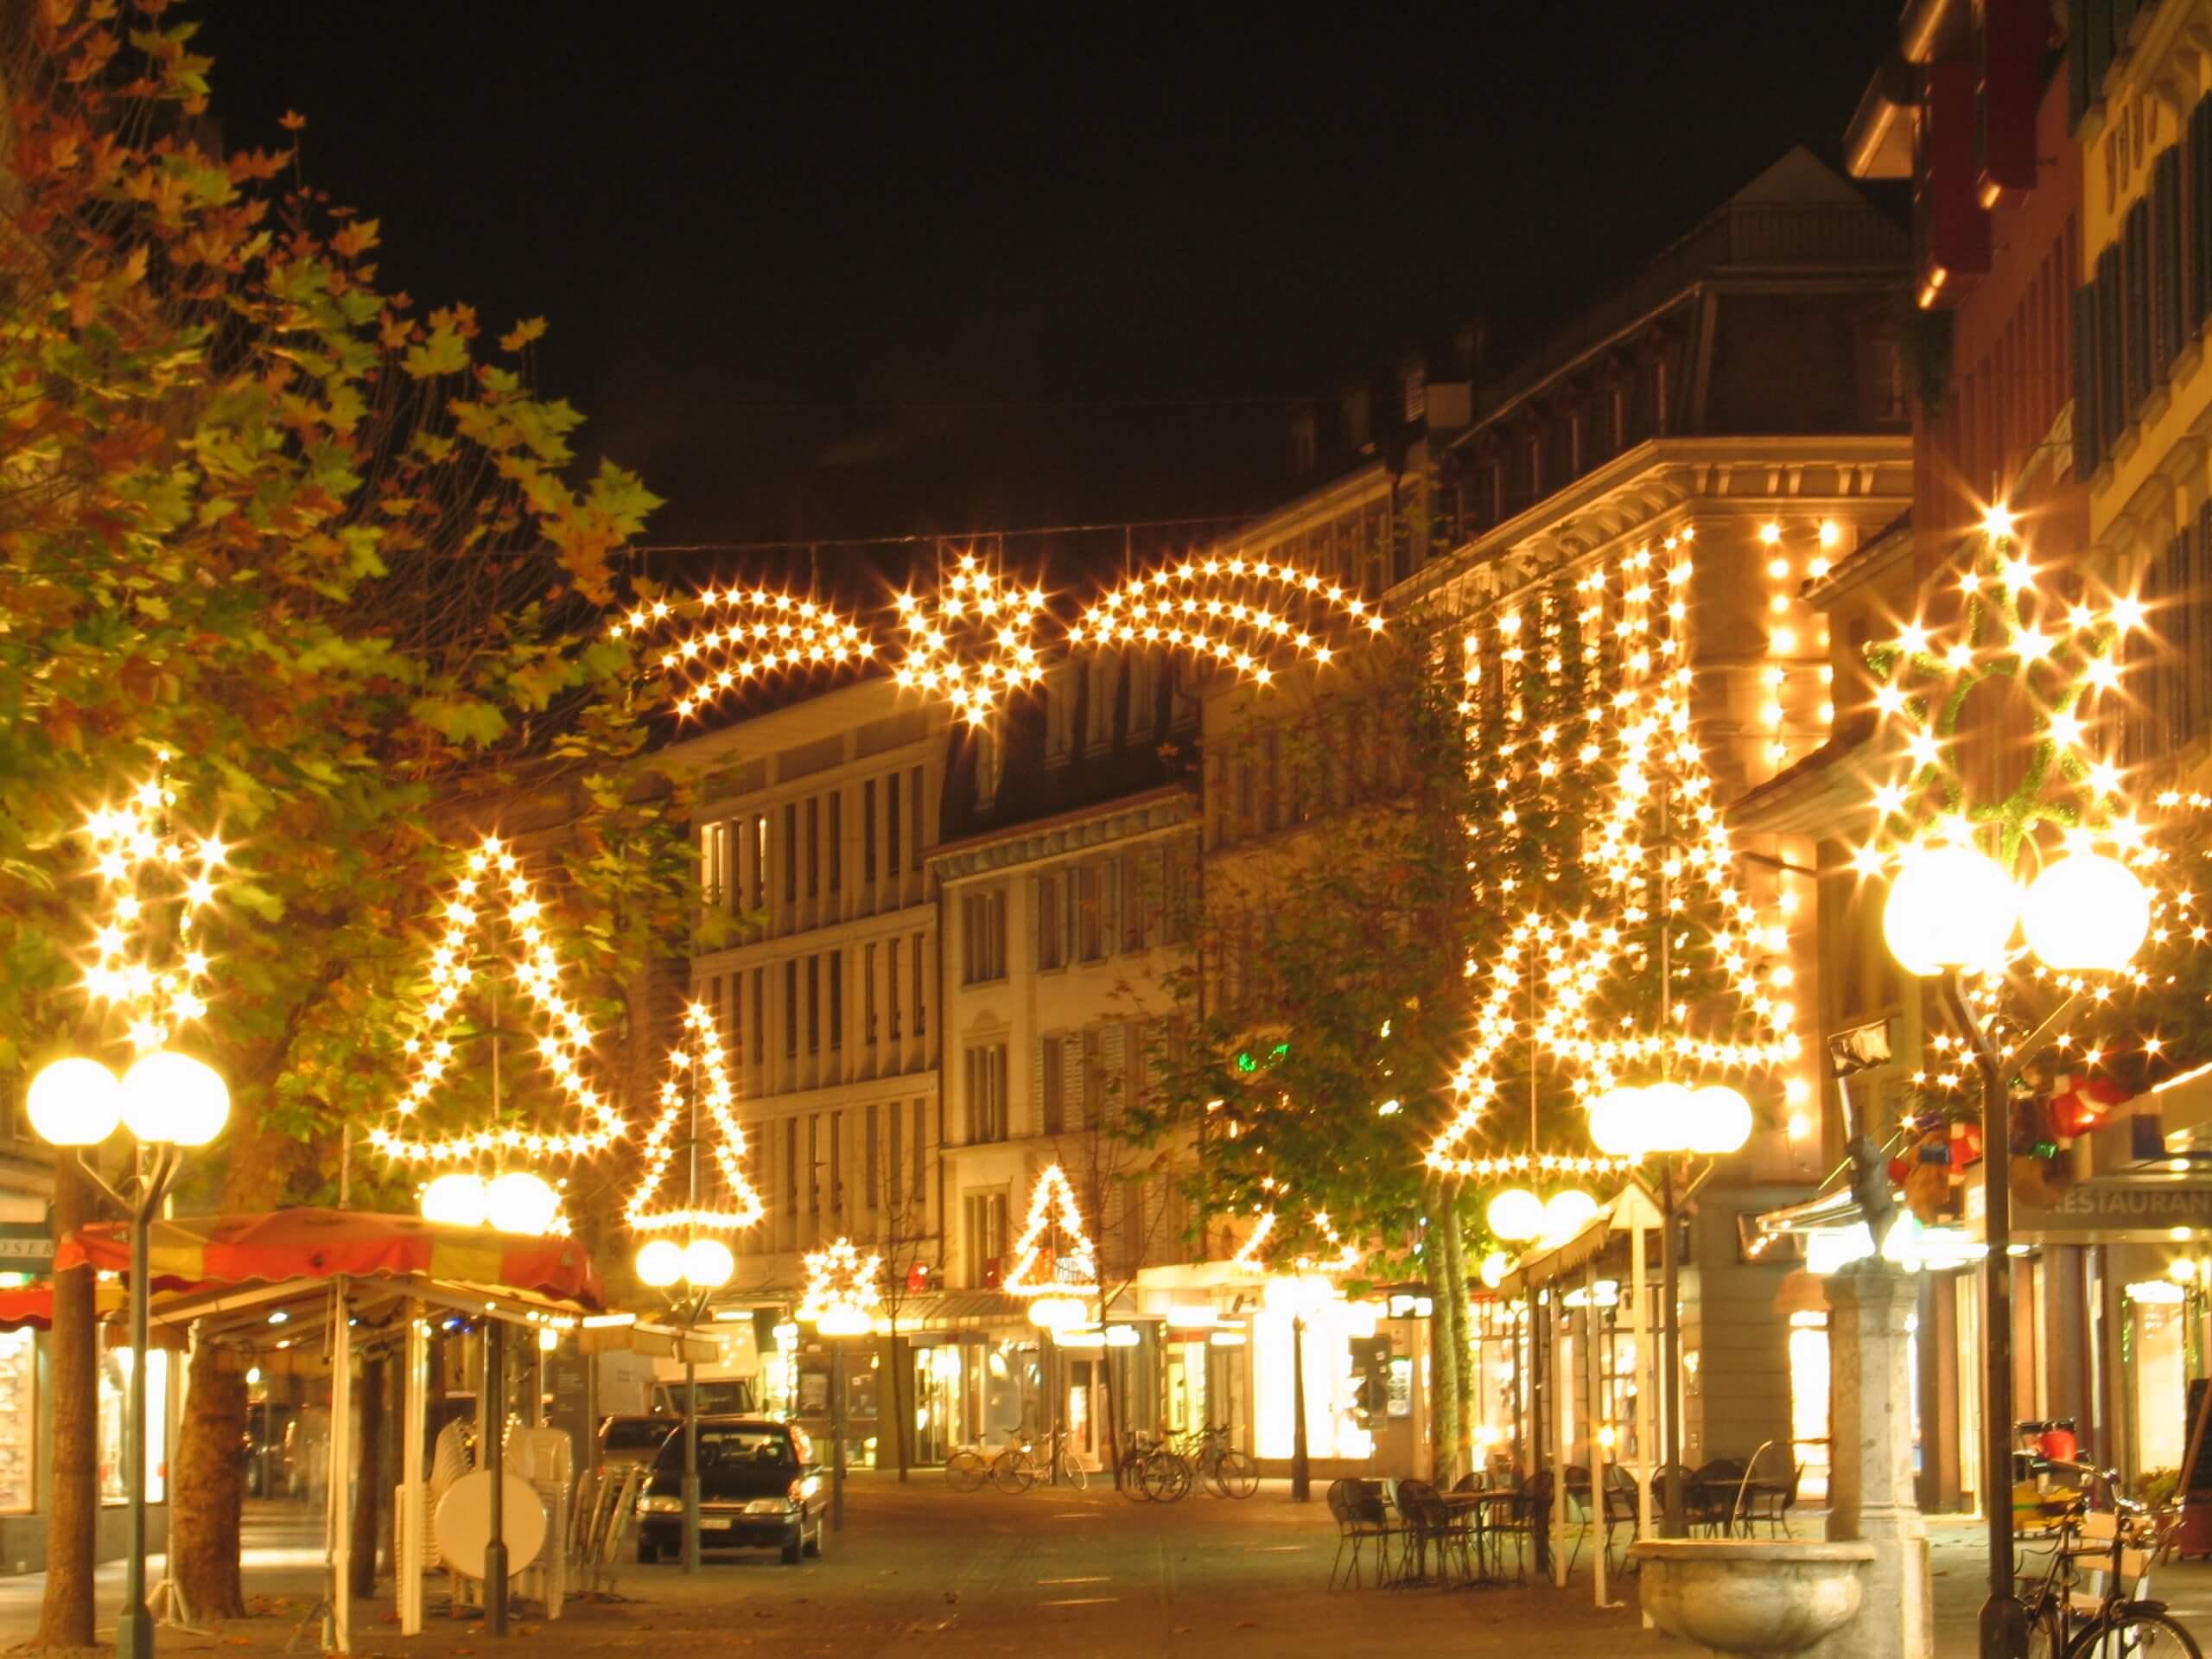 thun-baelliz-winter-weihnachtsbeleuchtung